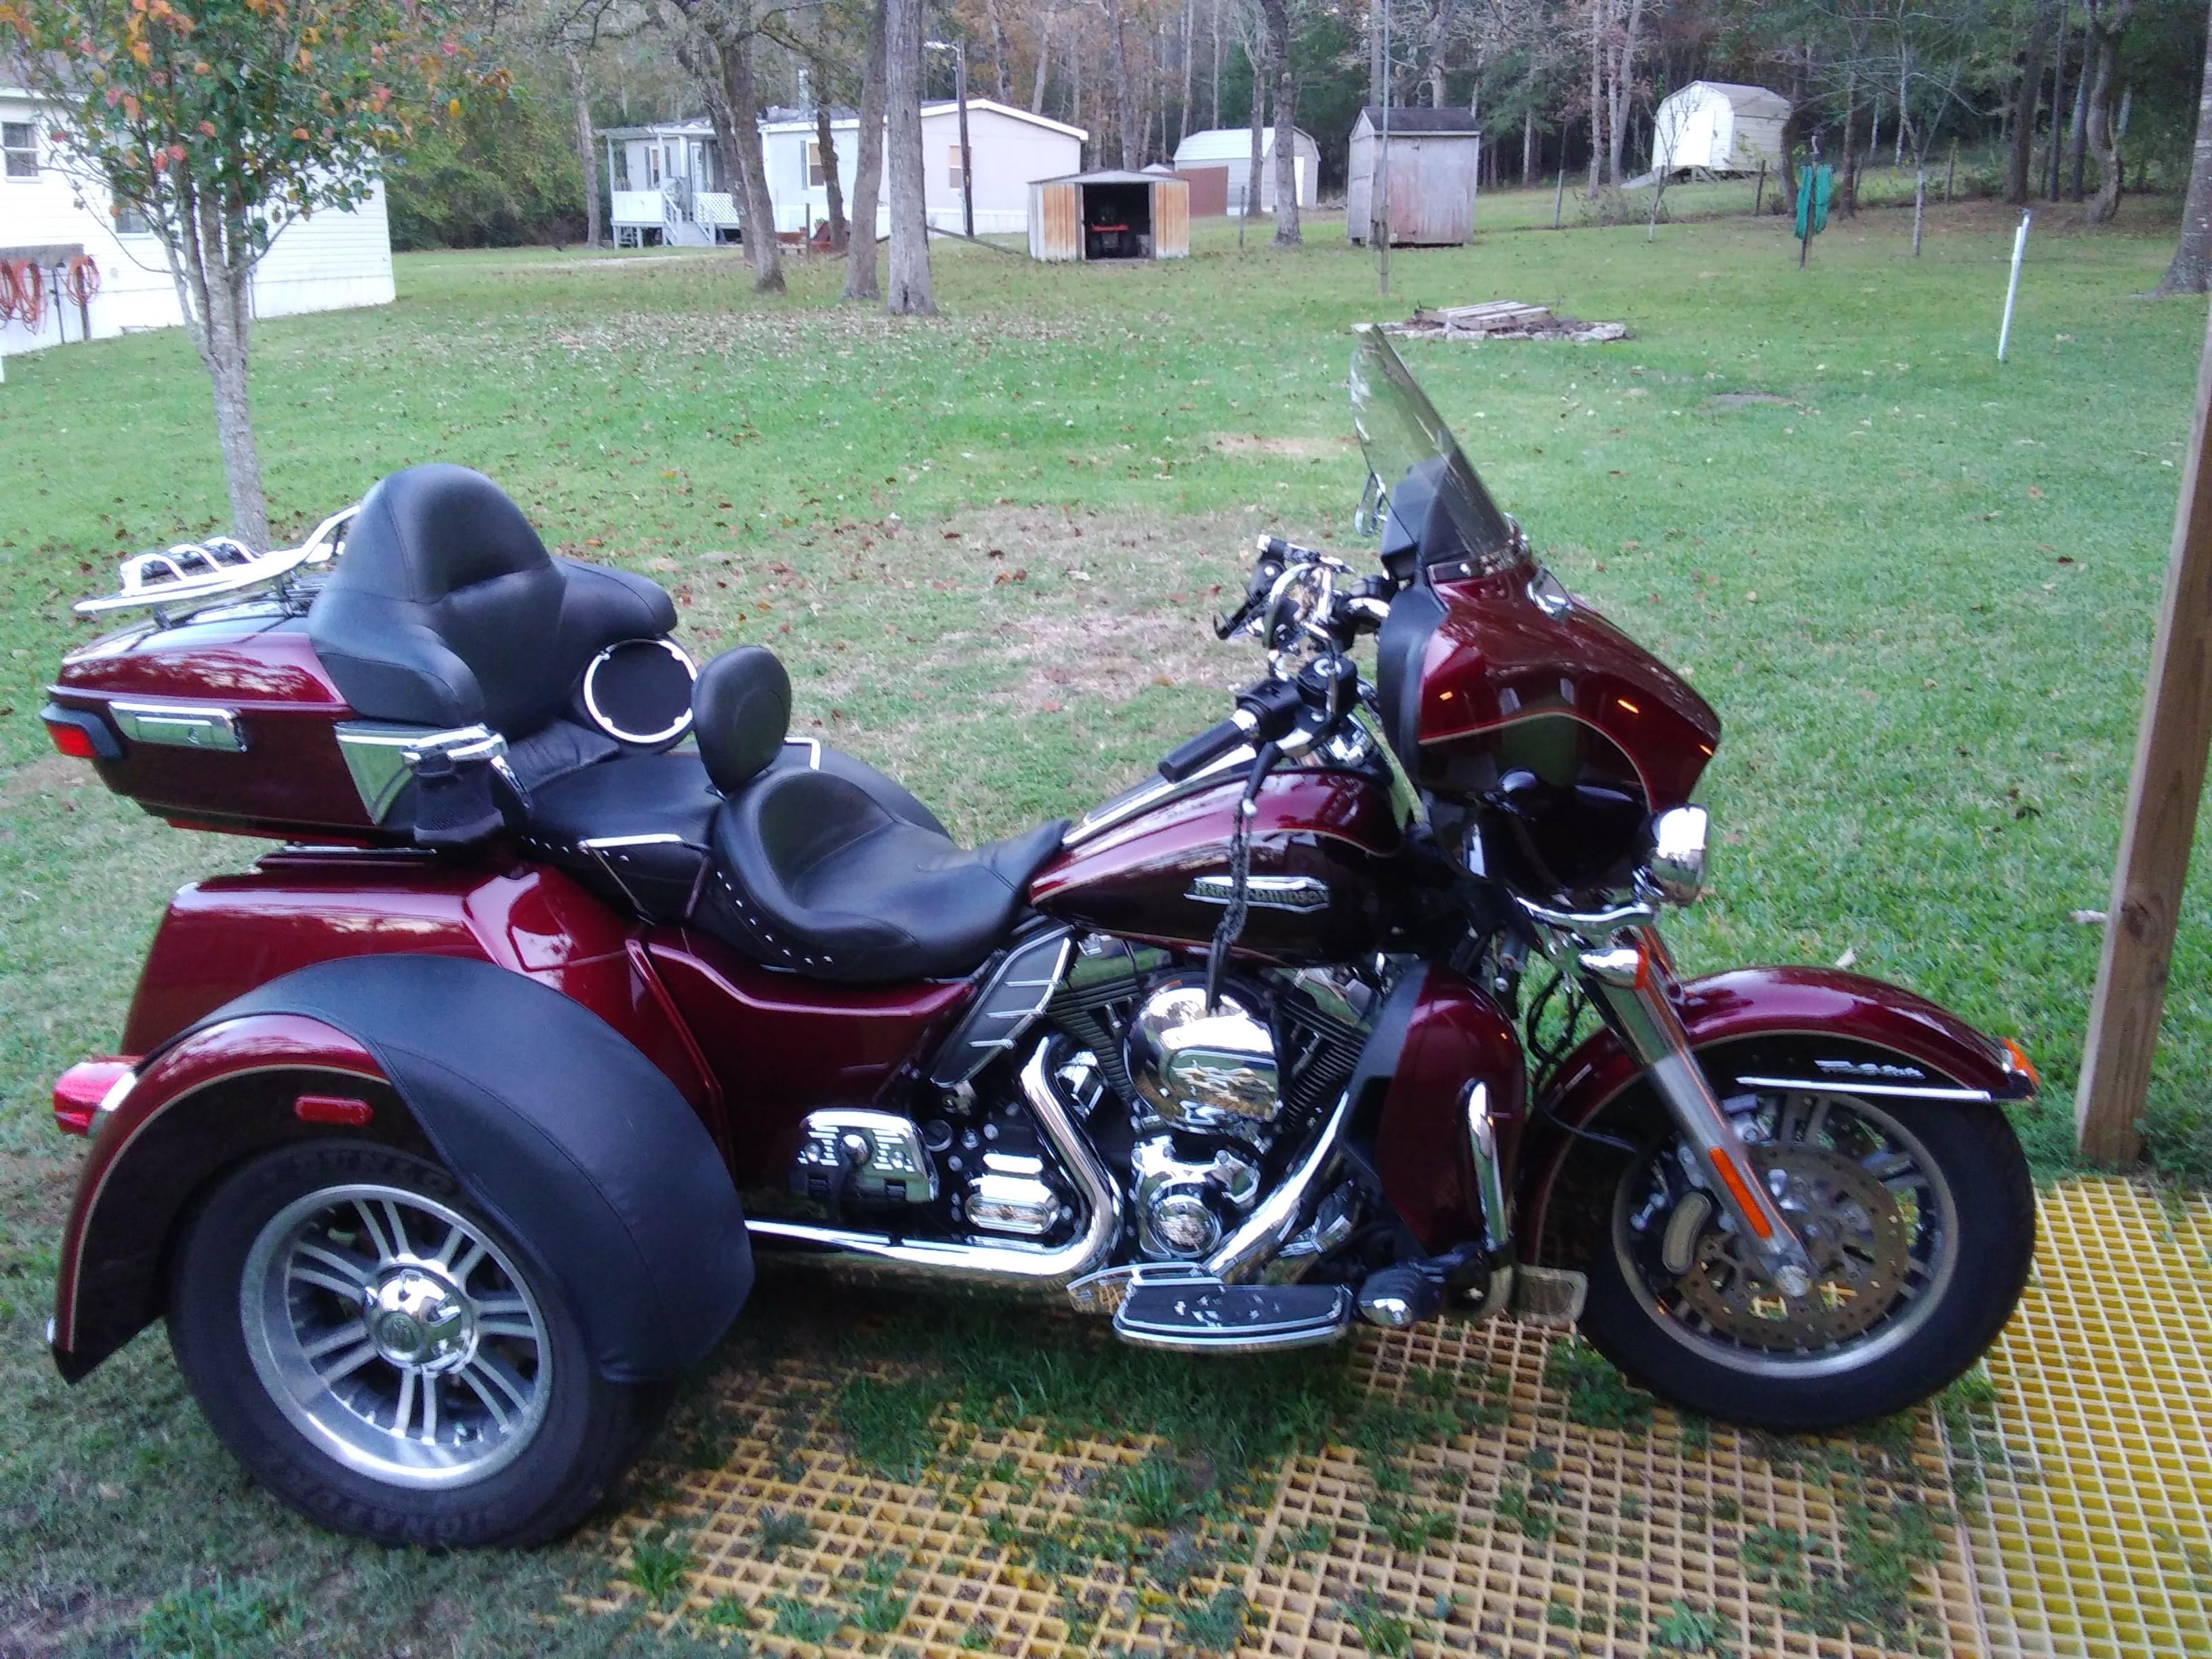 2014 Harley Davidson Flhtcutg Tri Glide Ultra Classic Red Trailer Wiring Harness Cayenne Hockley Texas 787784 Chopperexchange